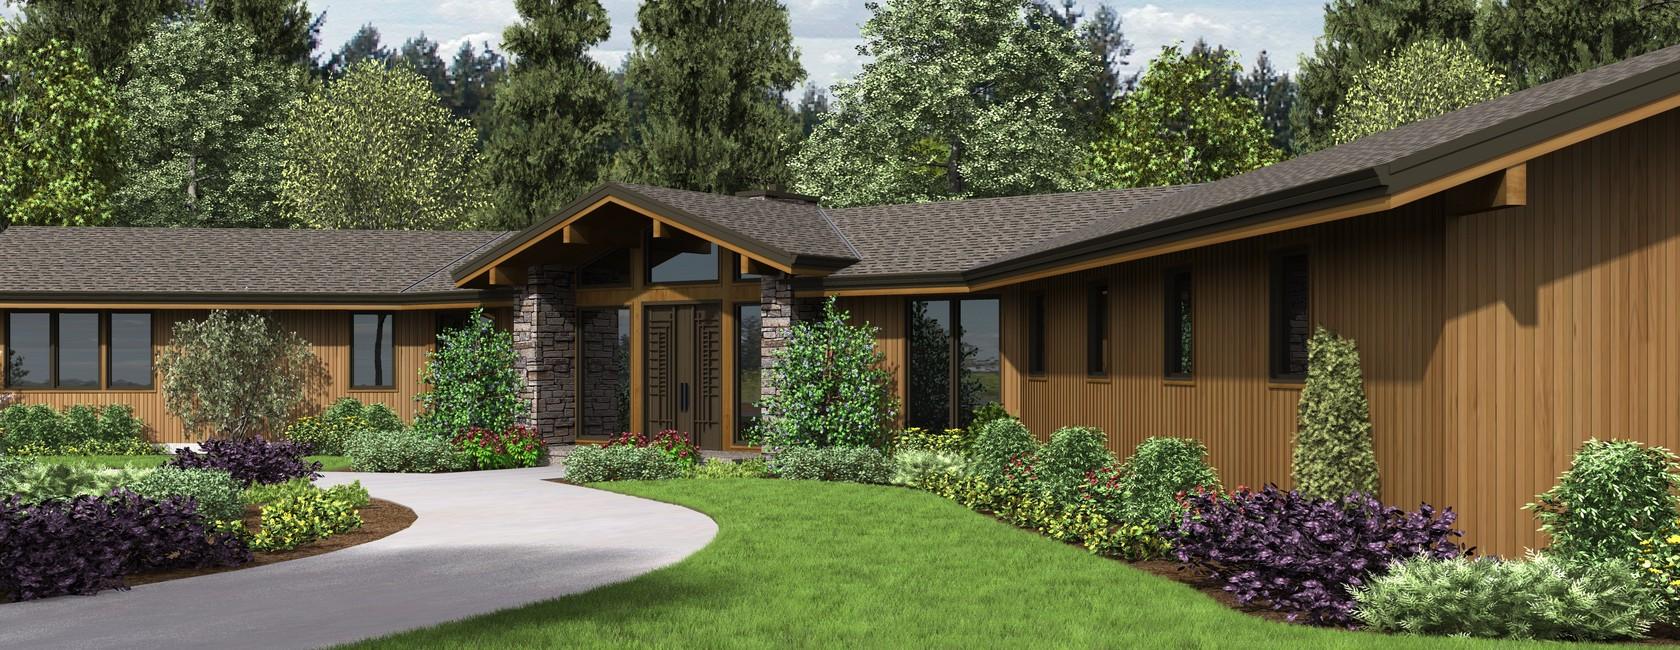 home design house – modern house